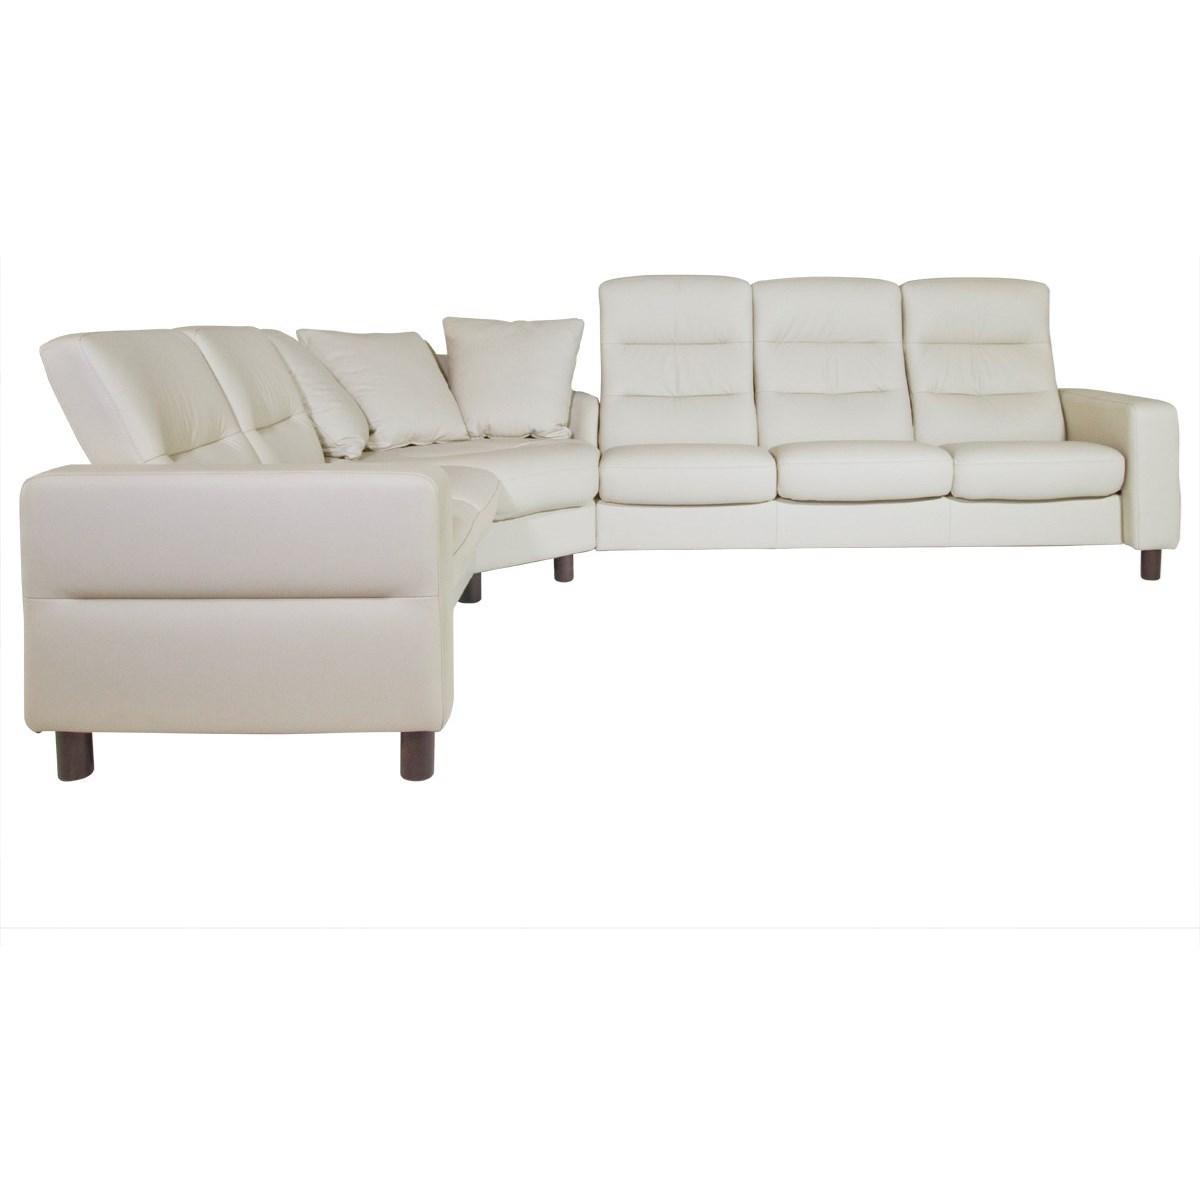 Stressless Wave Reclining Sectional Homeworld Furniture